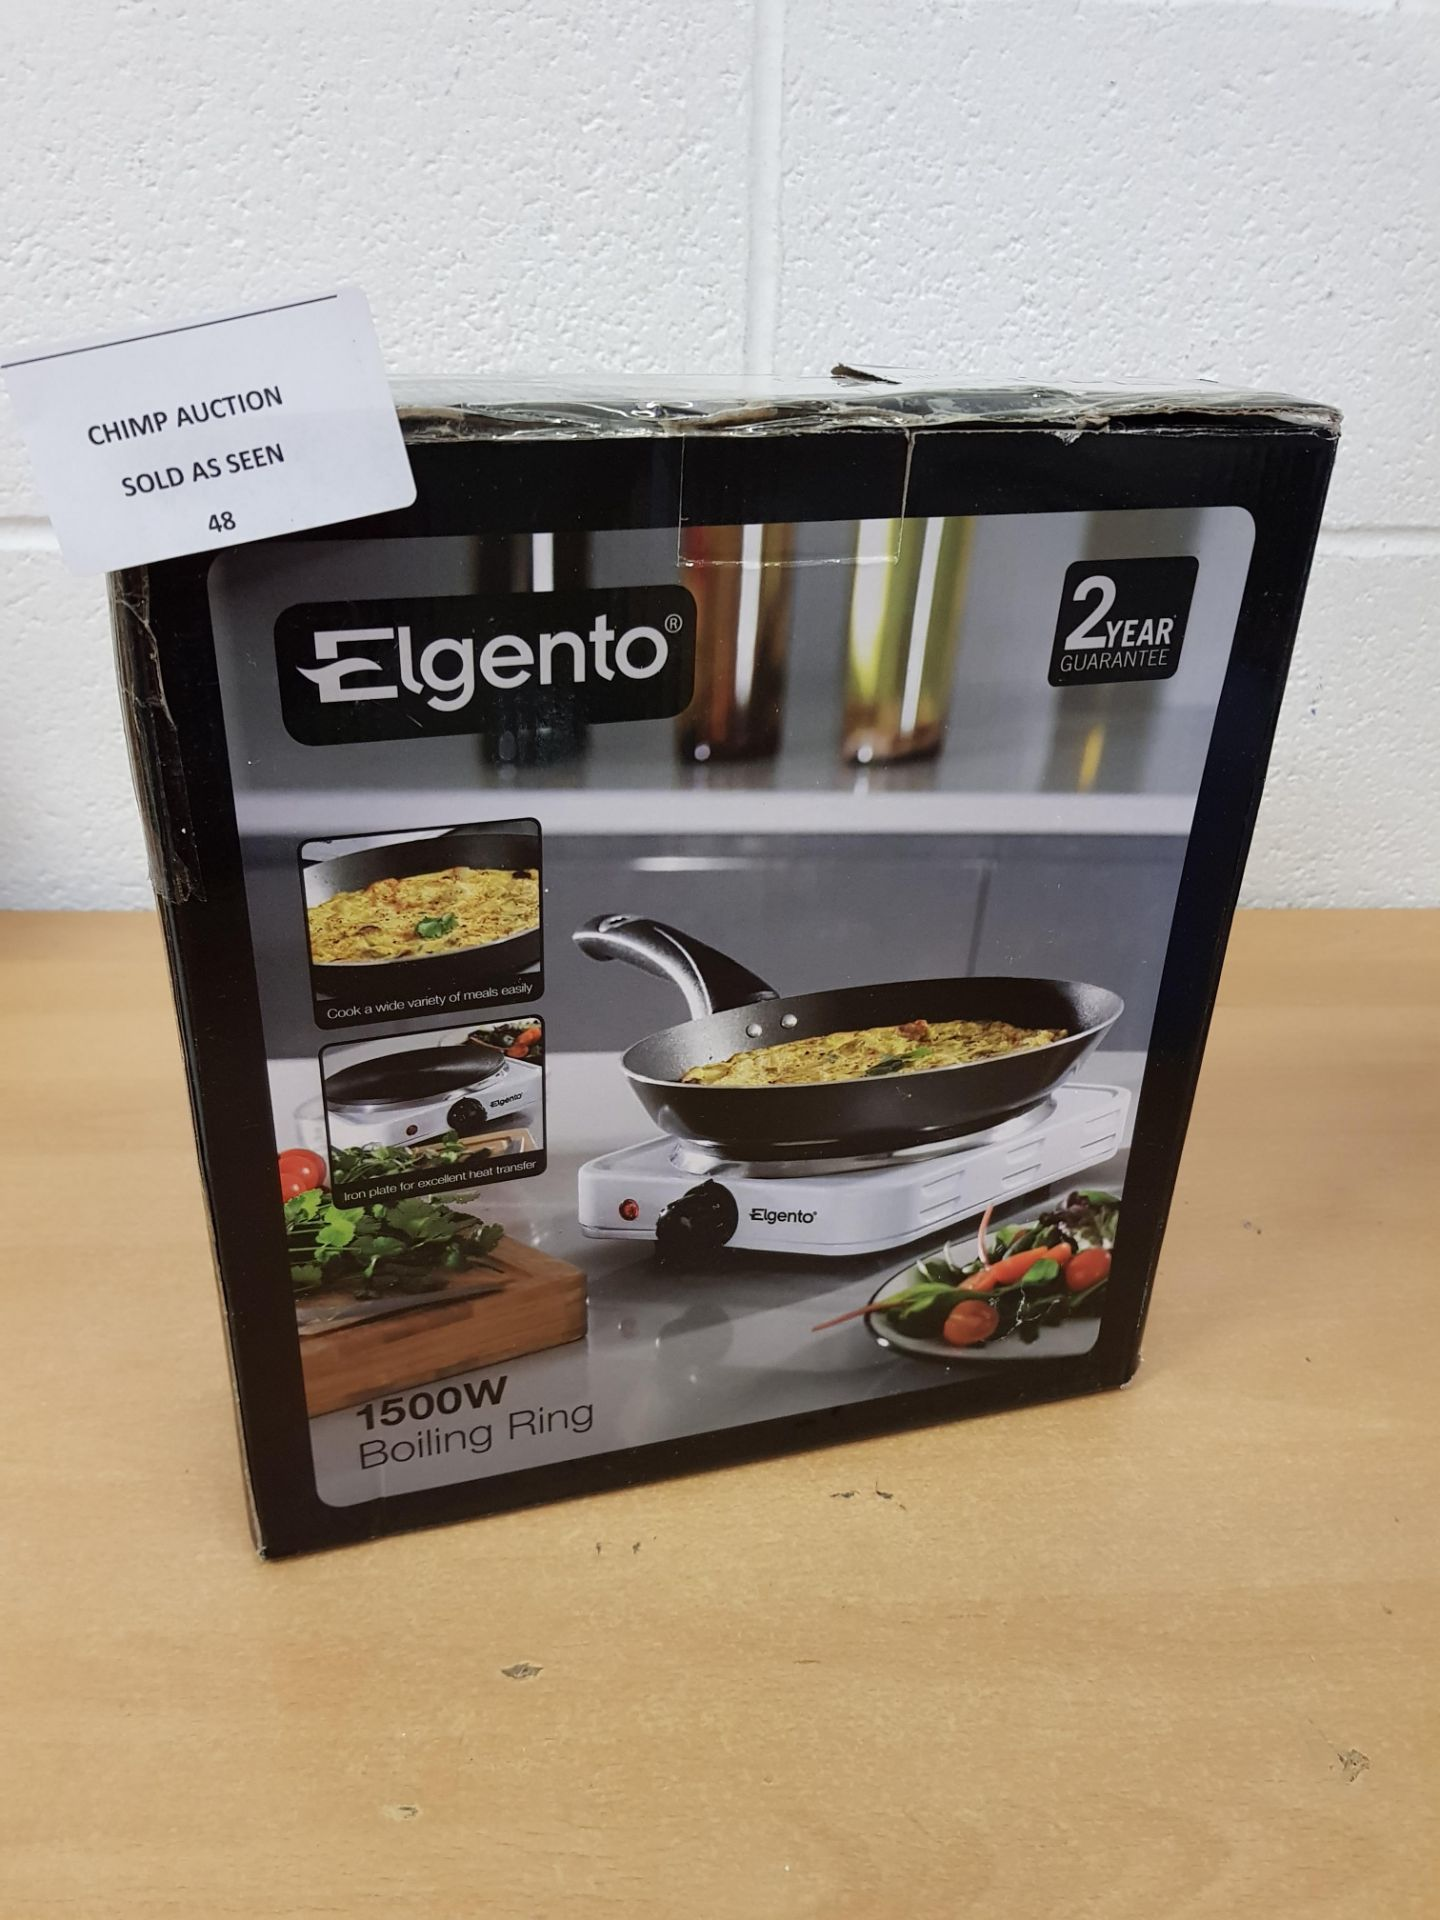 Lot 48 - Elgento 1500W Boiling Ring